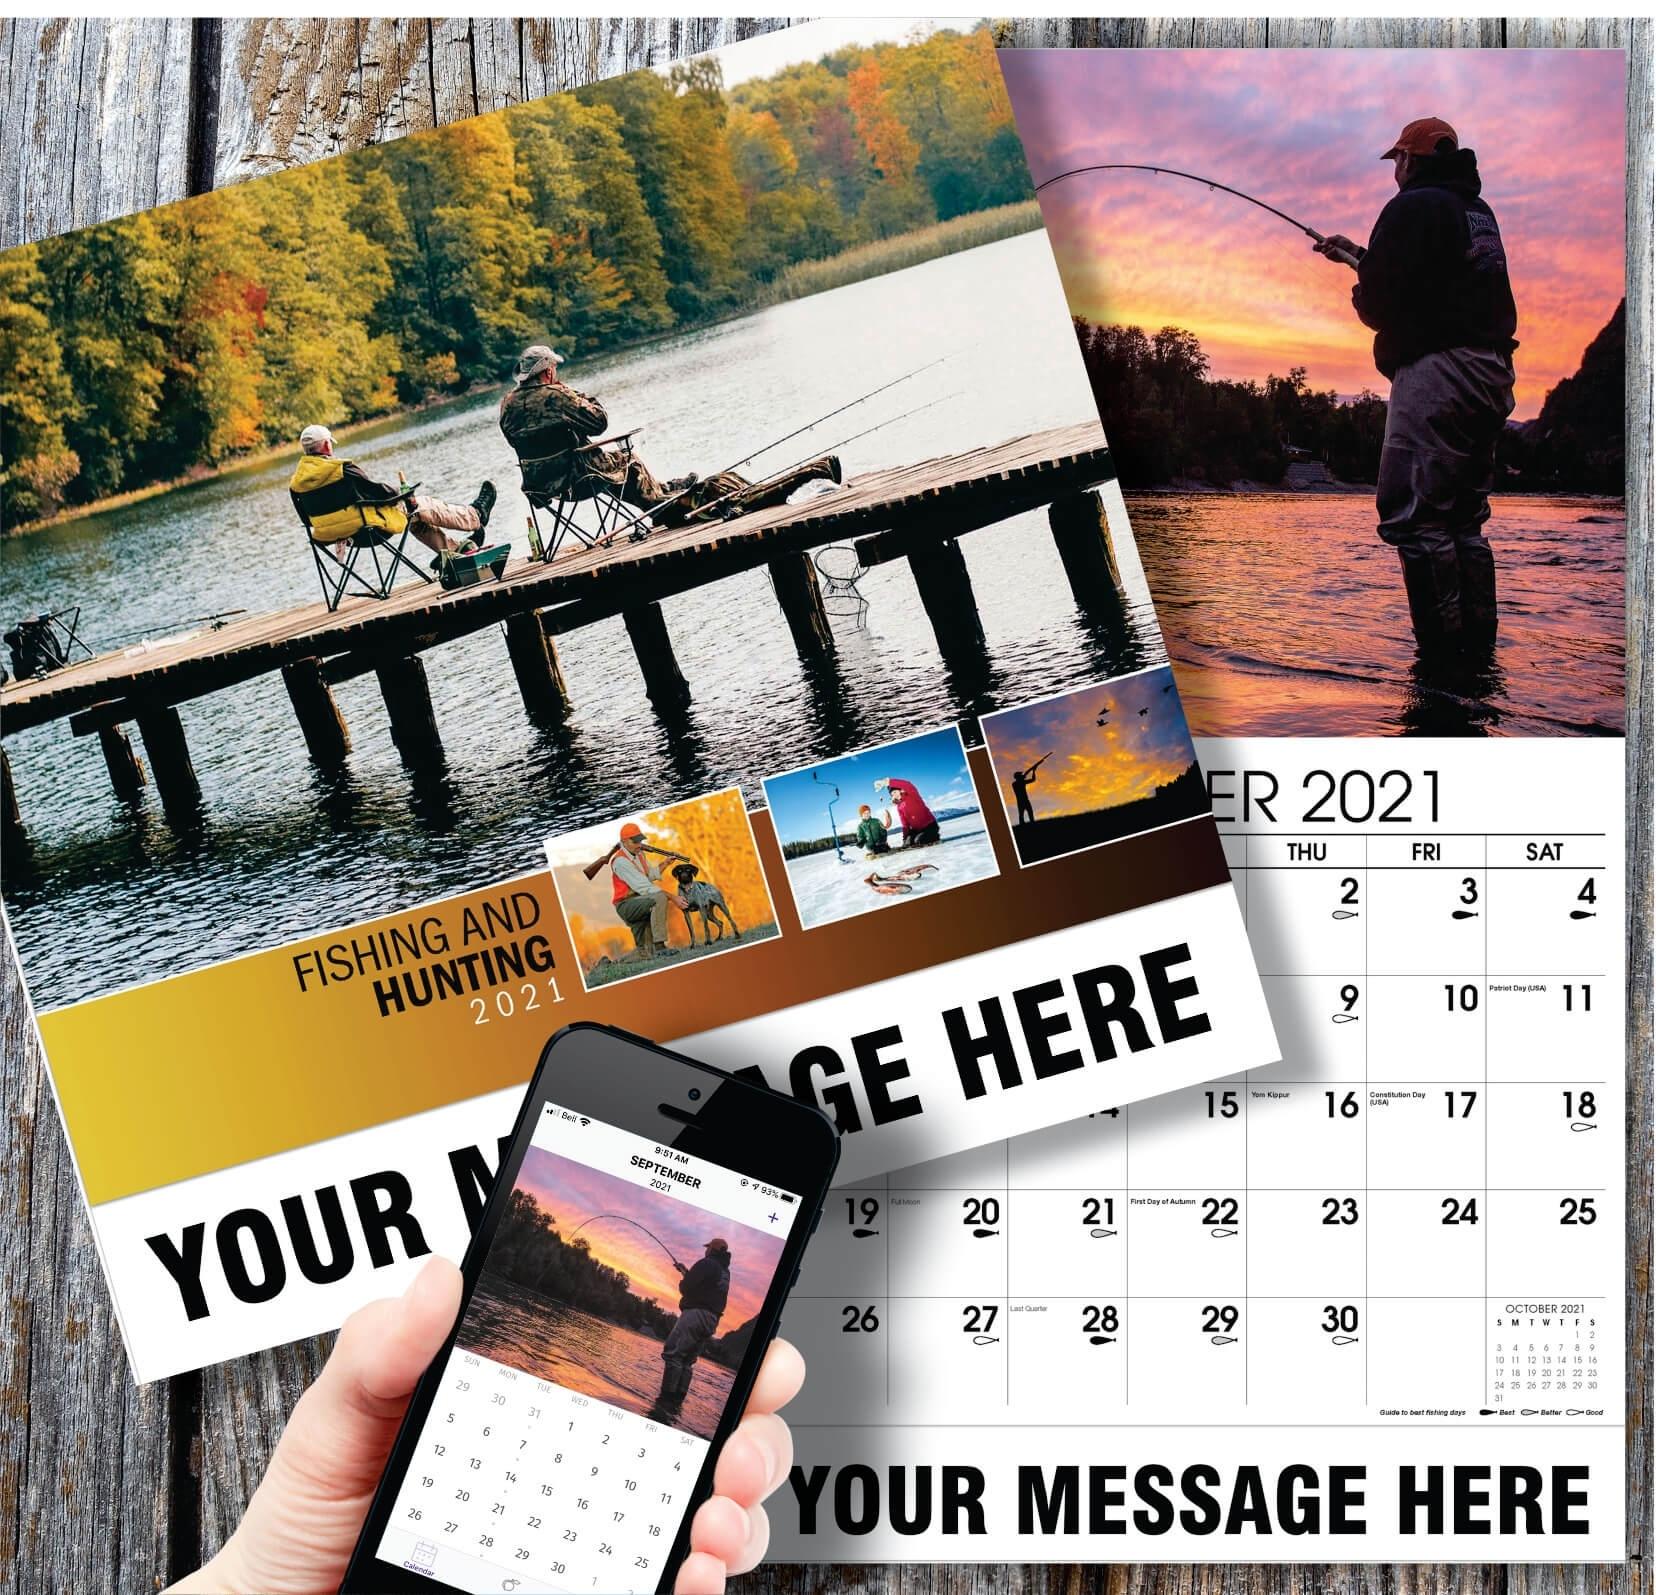 2021 Promotional Advertising Calendar   Fishing And Hunting June 2021 Fishing Calendar